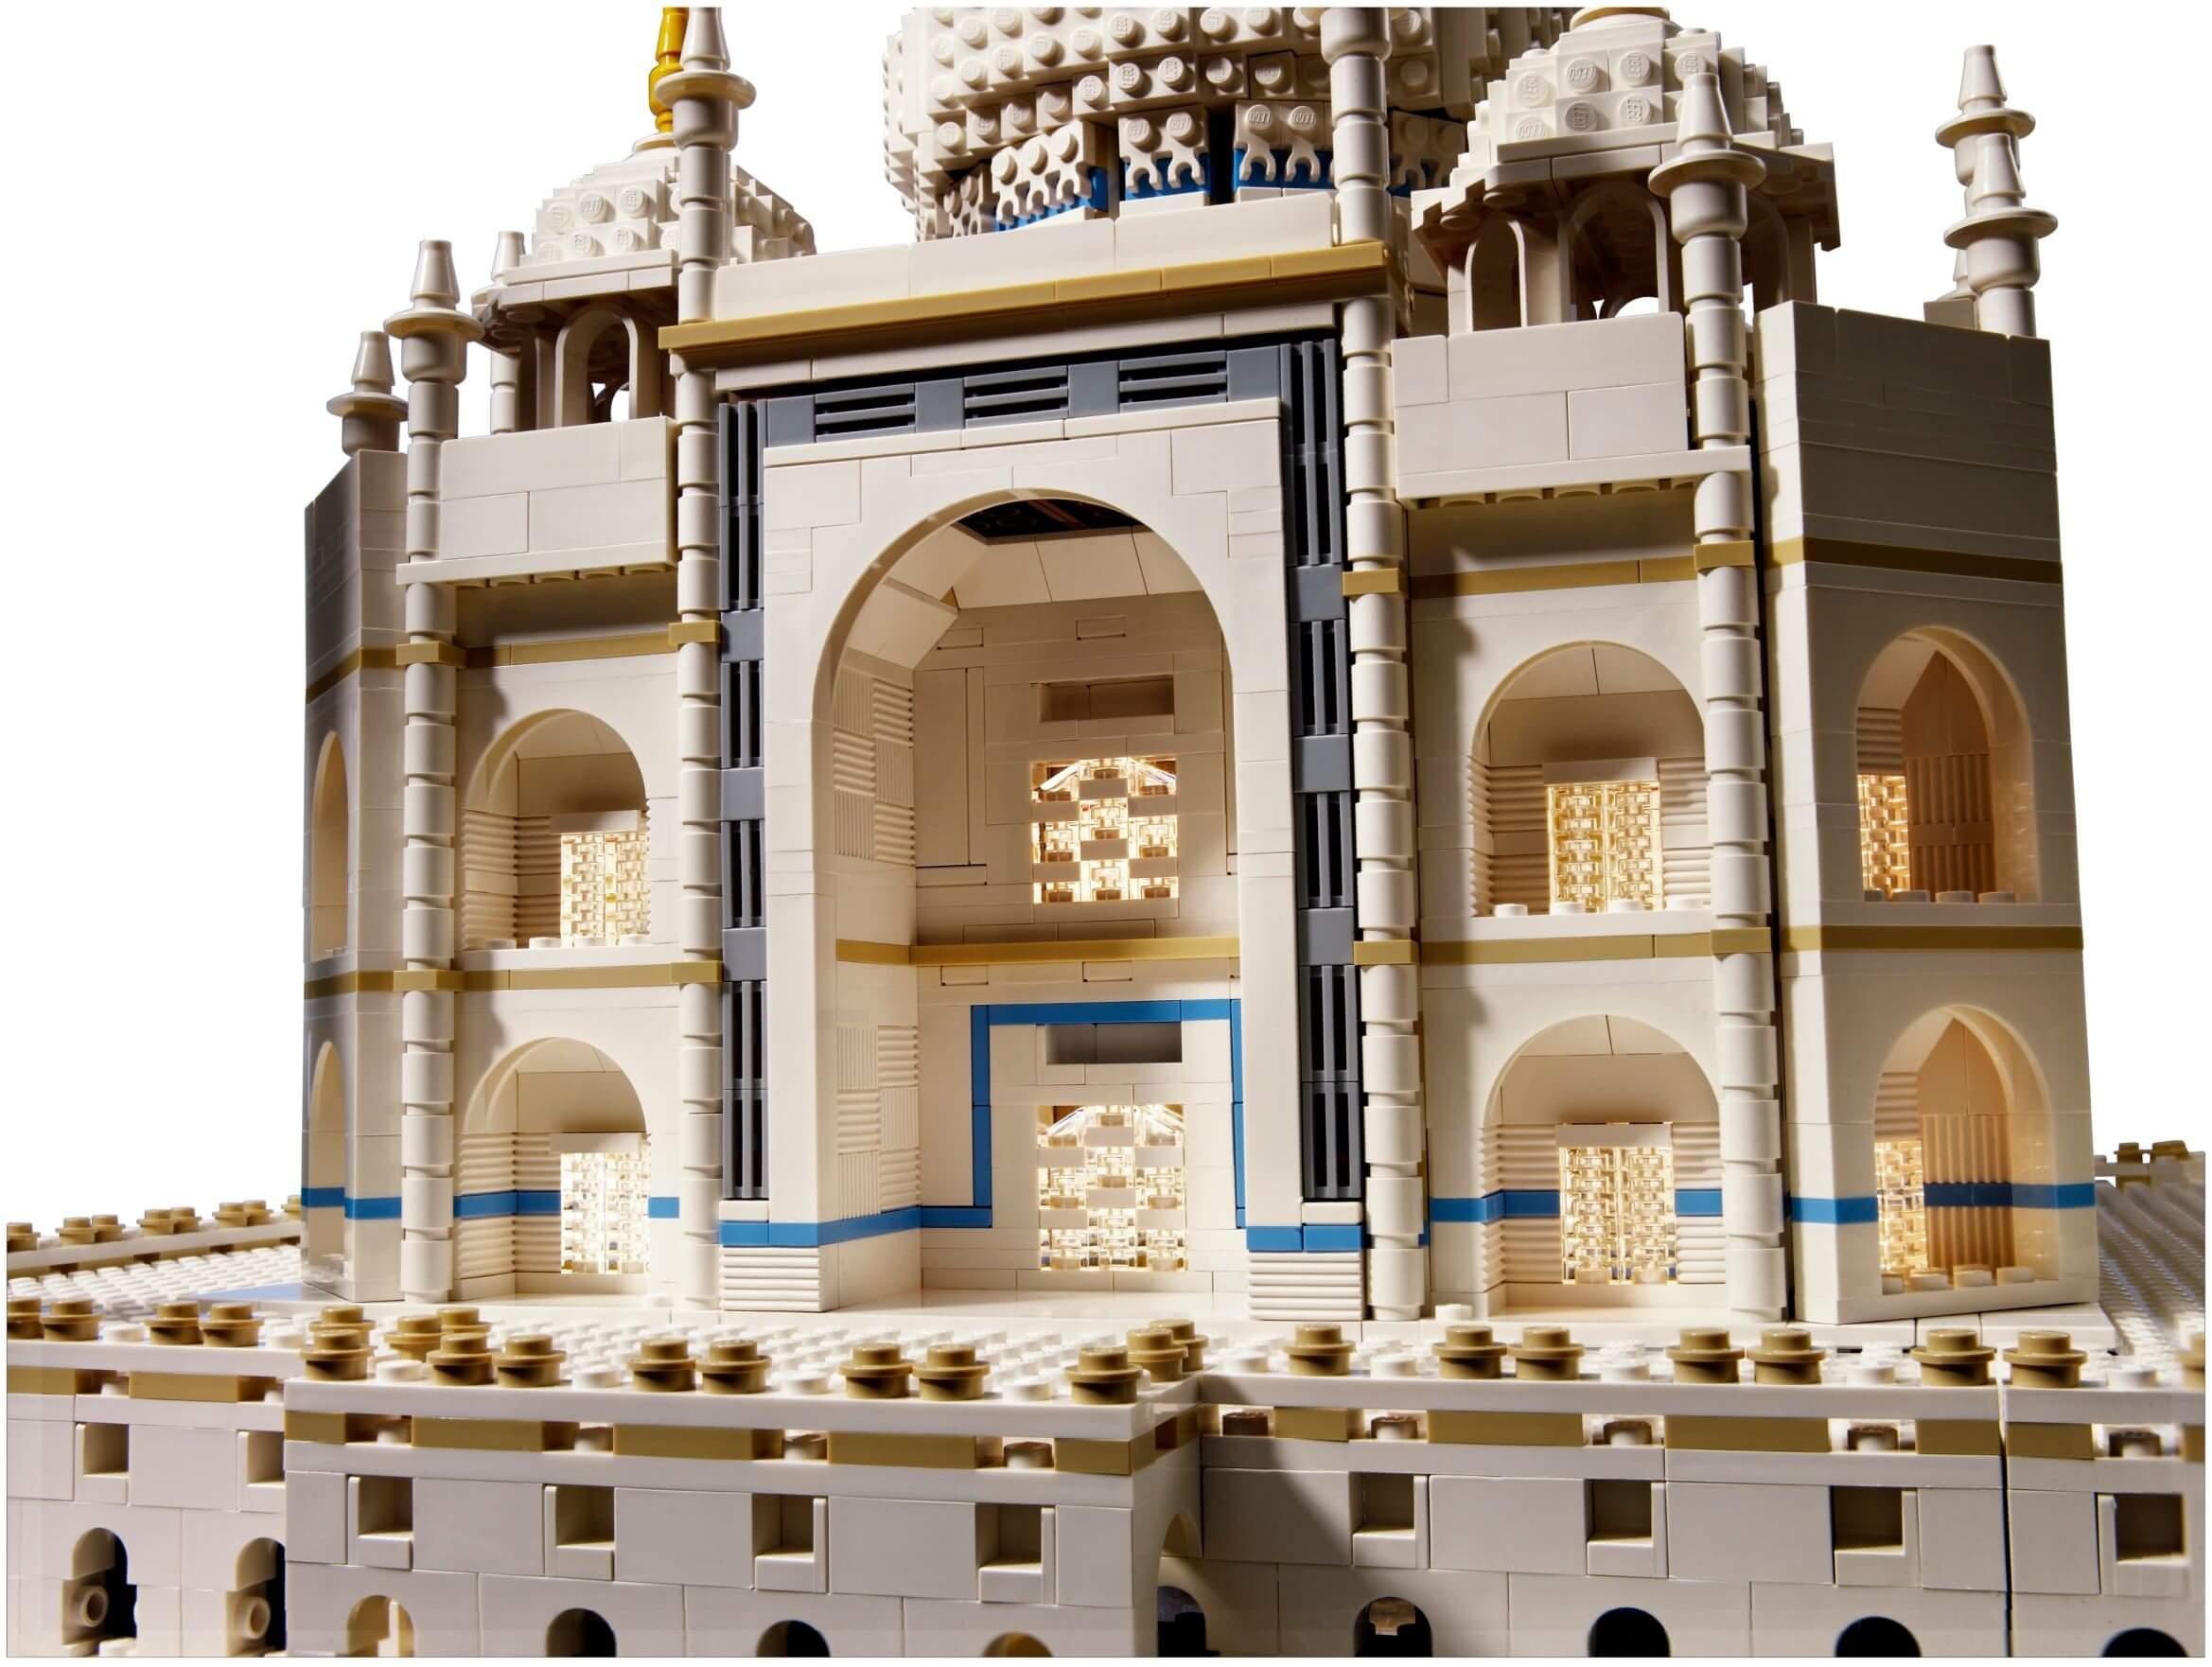 Mua đồ chơi LEGO 10256 - LEGO Architecture 10256 - Ngôi đền Taj Mahal (LEGO Architecture 10256 Taj Mahal)